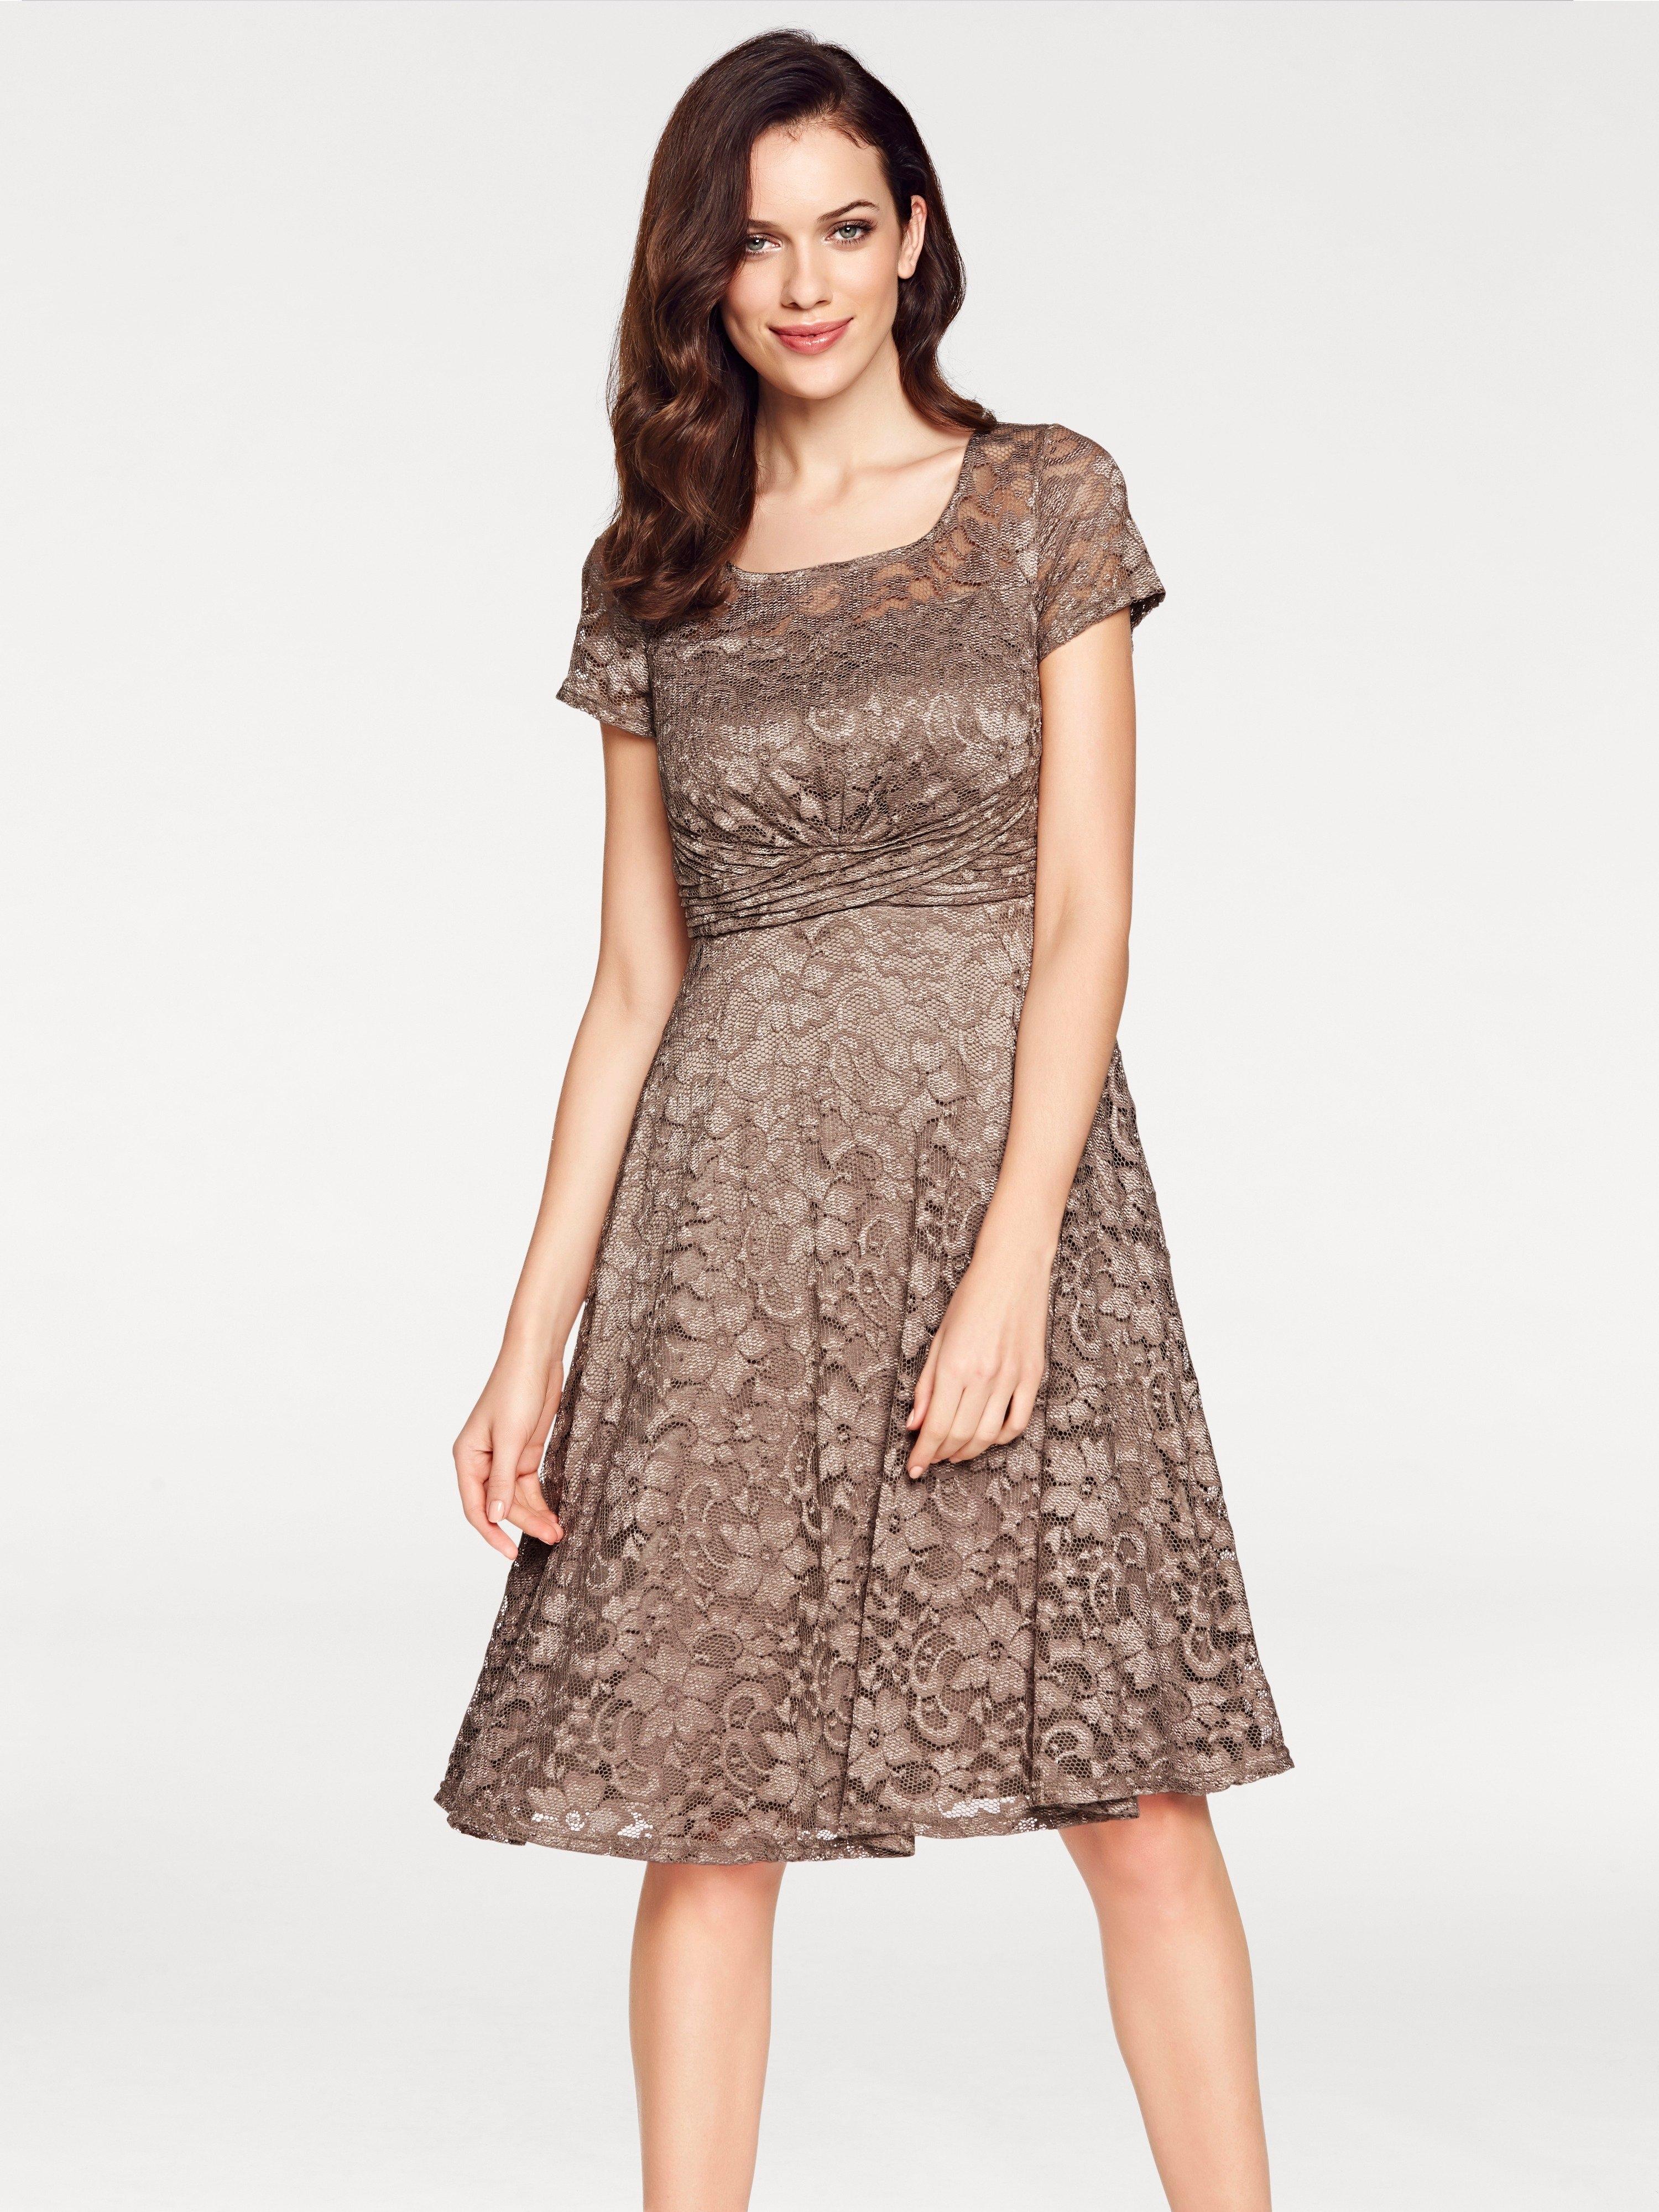 a2f8def31a6cba Kanten jurk in de online winkel